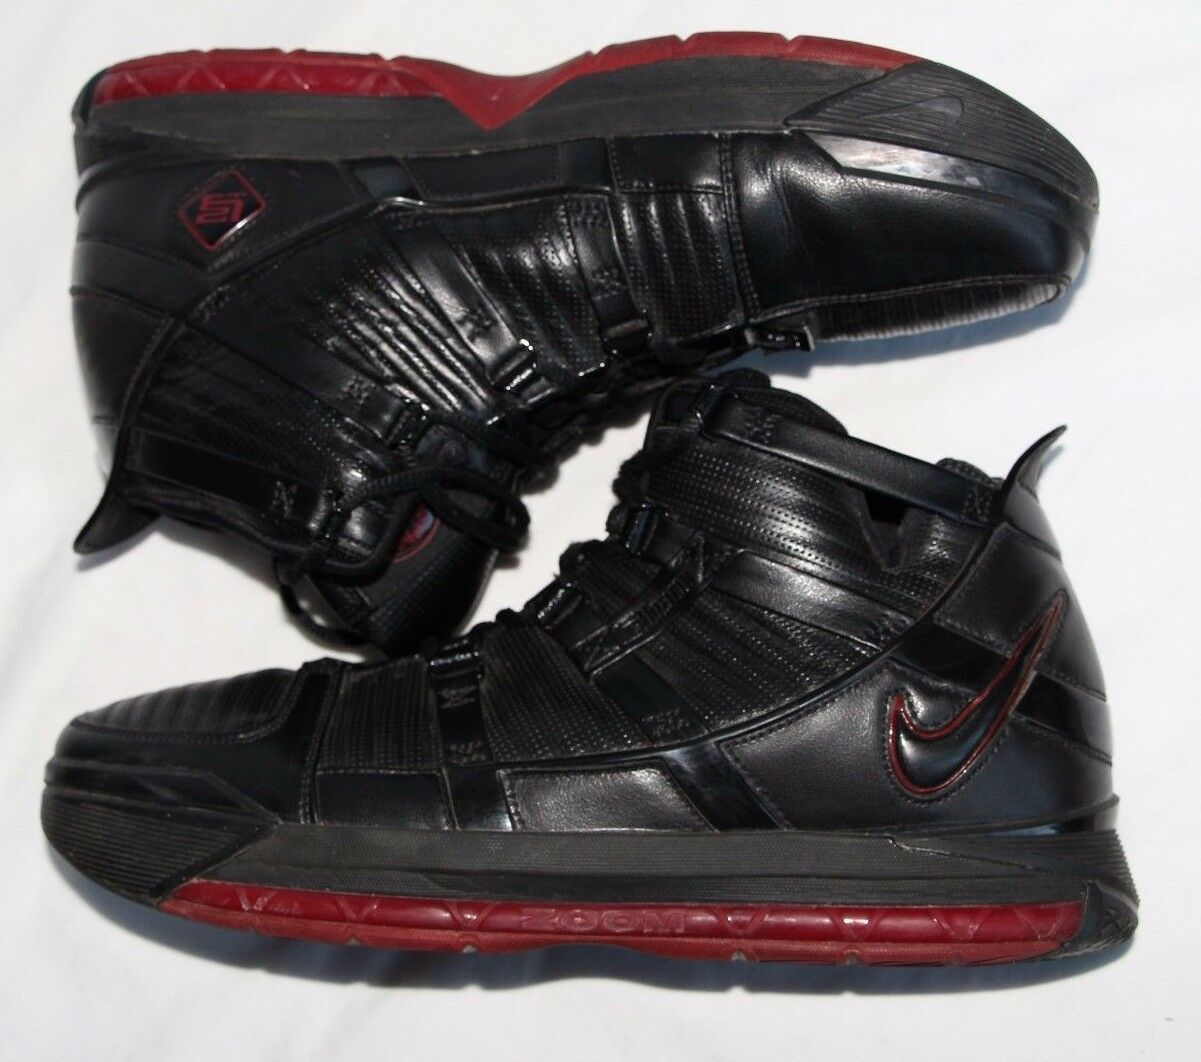 Nike Air Zoom Lebron III Black Leather High Top Basketball Men's U.S. 11.5 Wild casual shoes